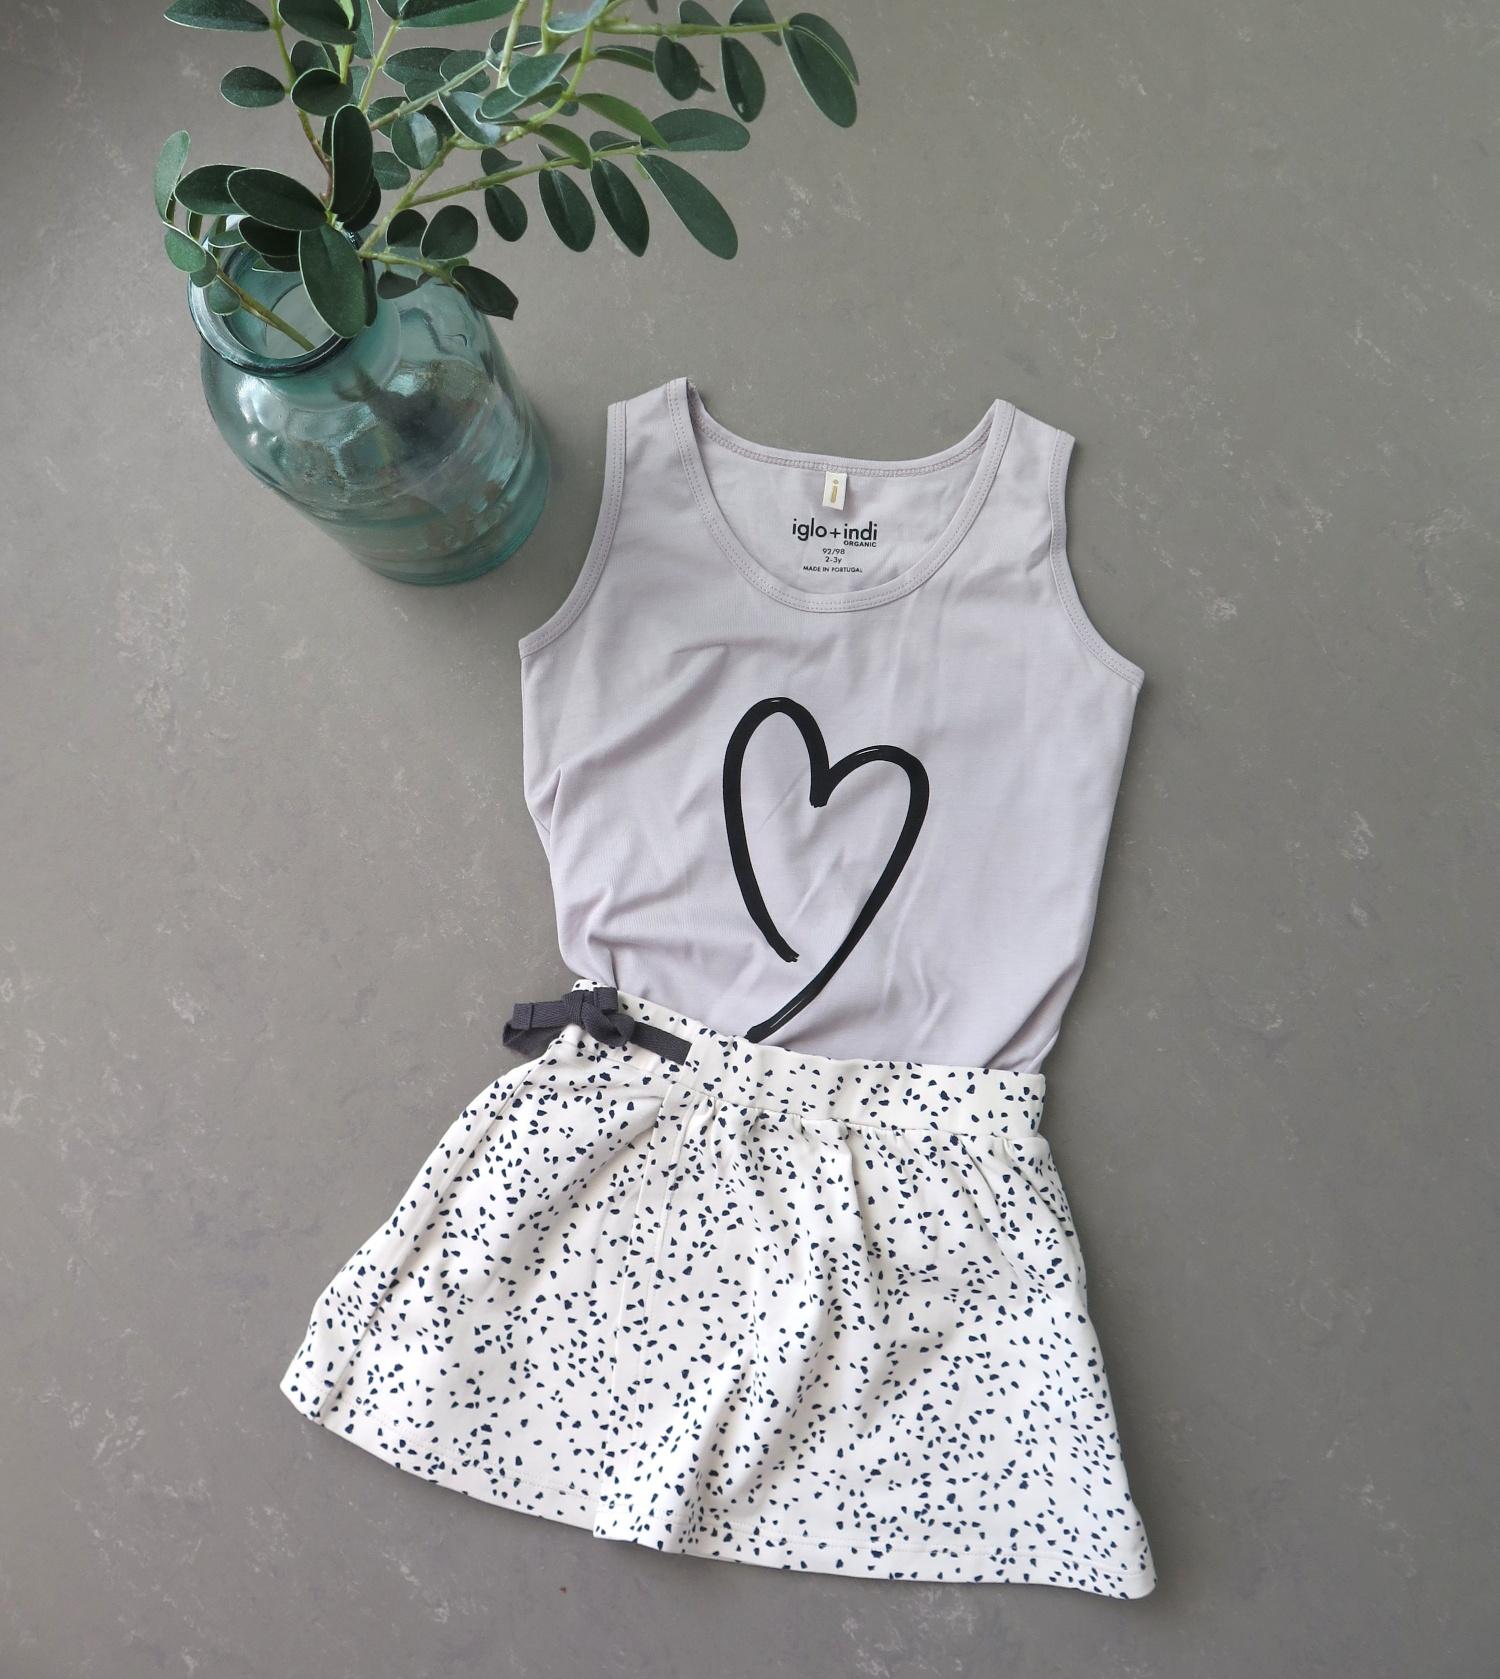 Zomer outfit moderne meisjeskleding